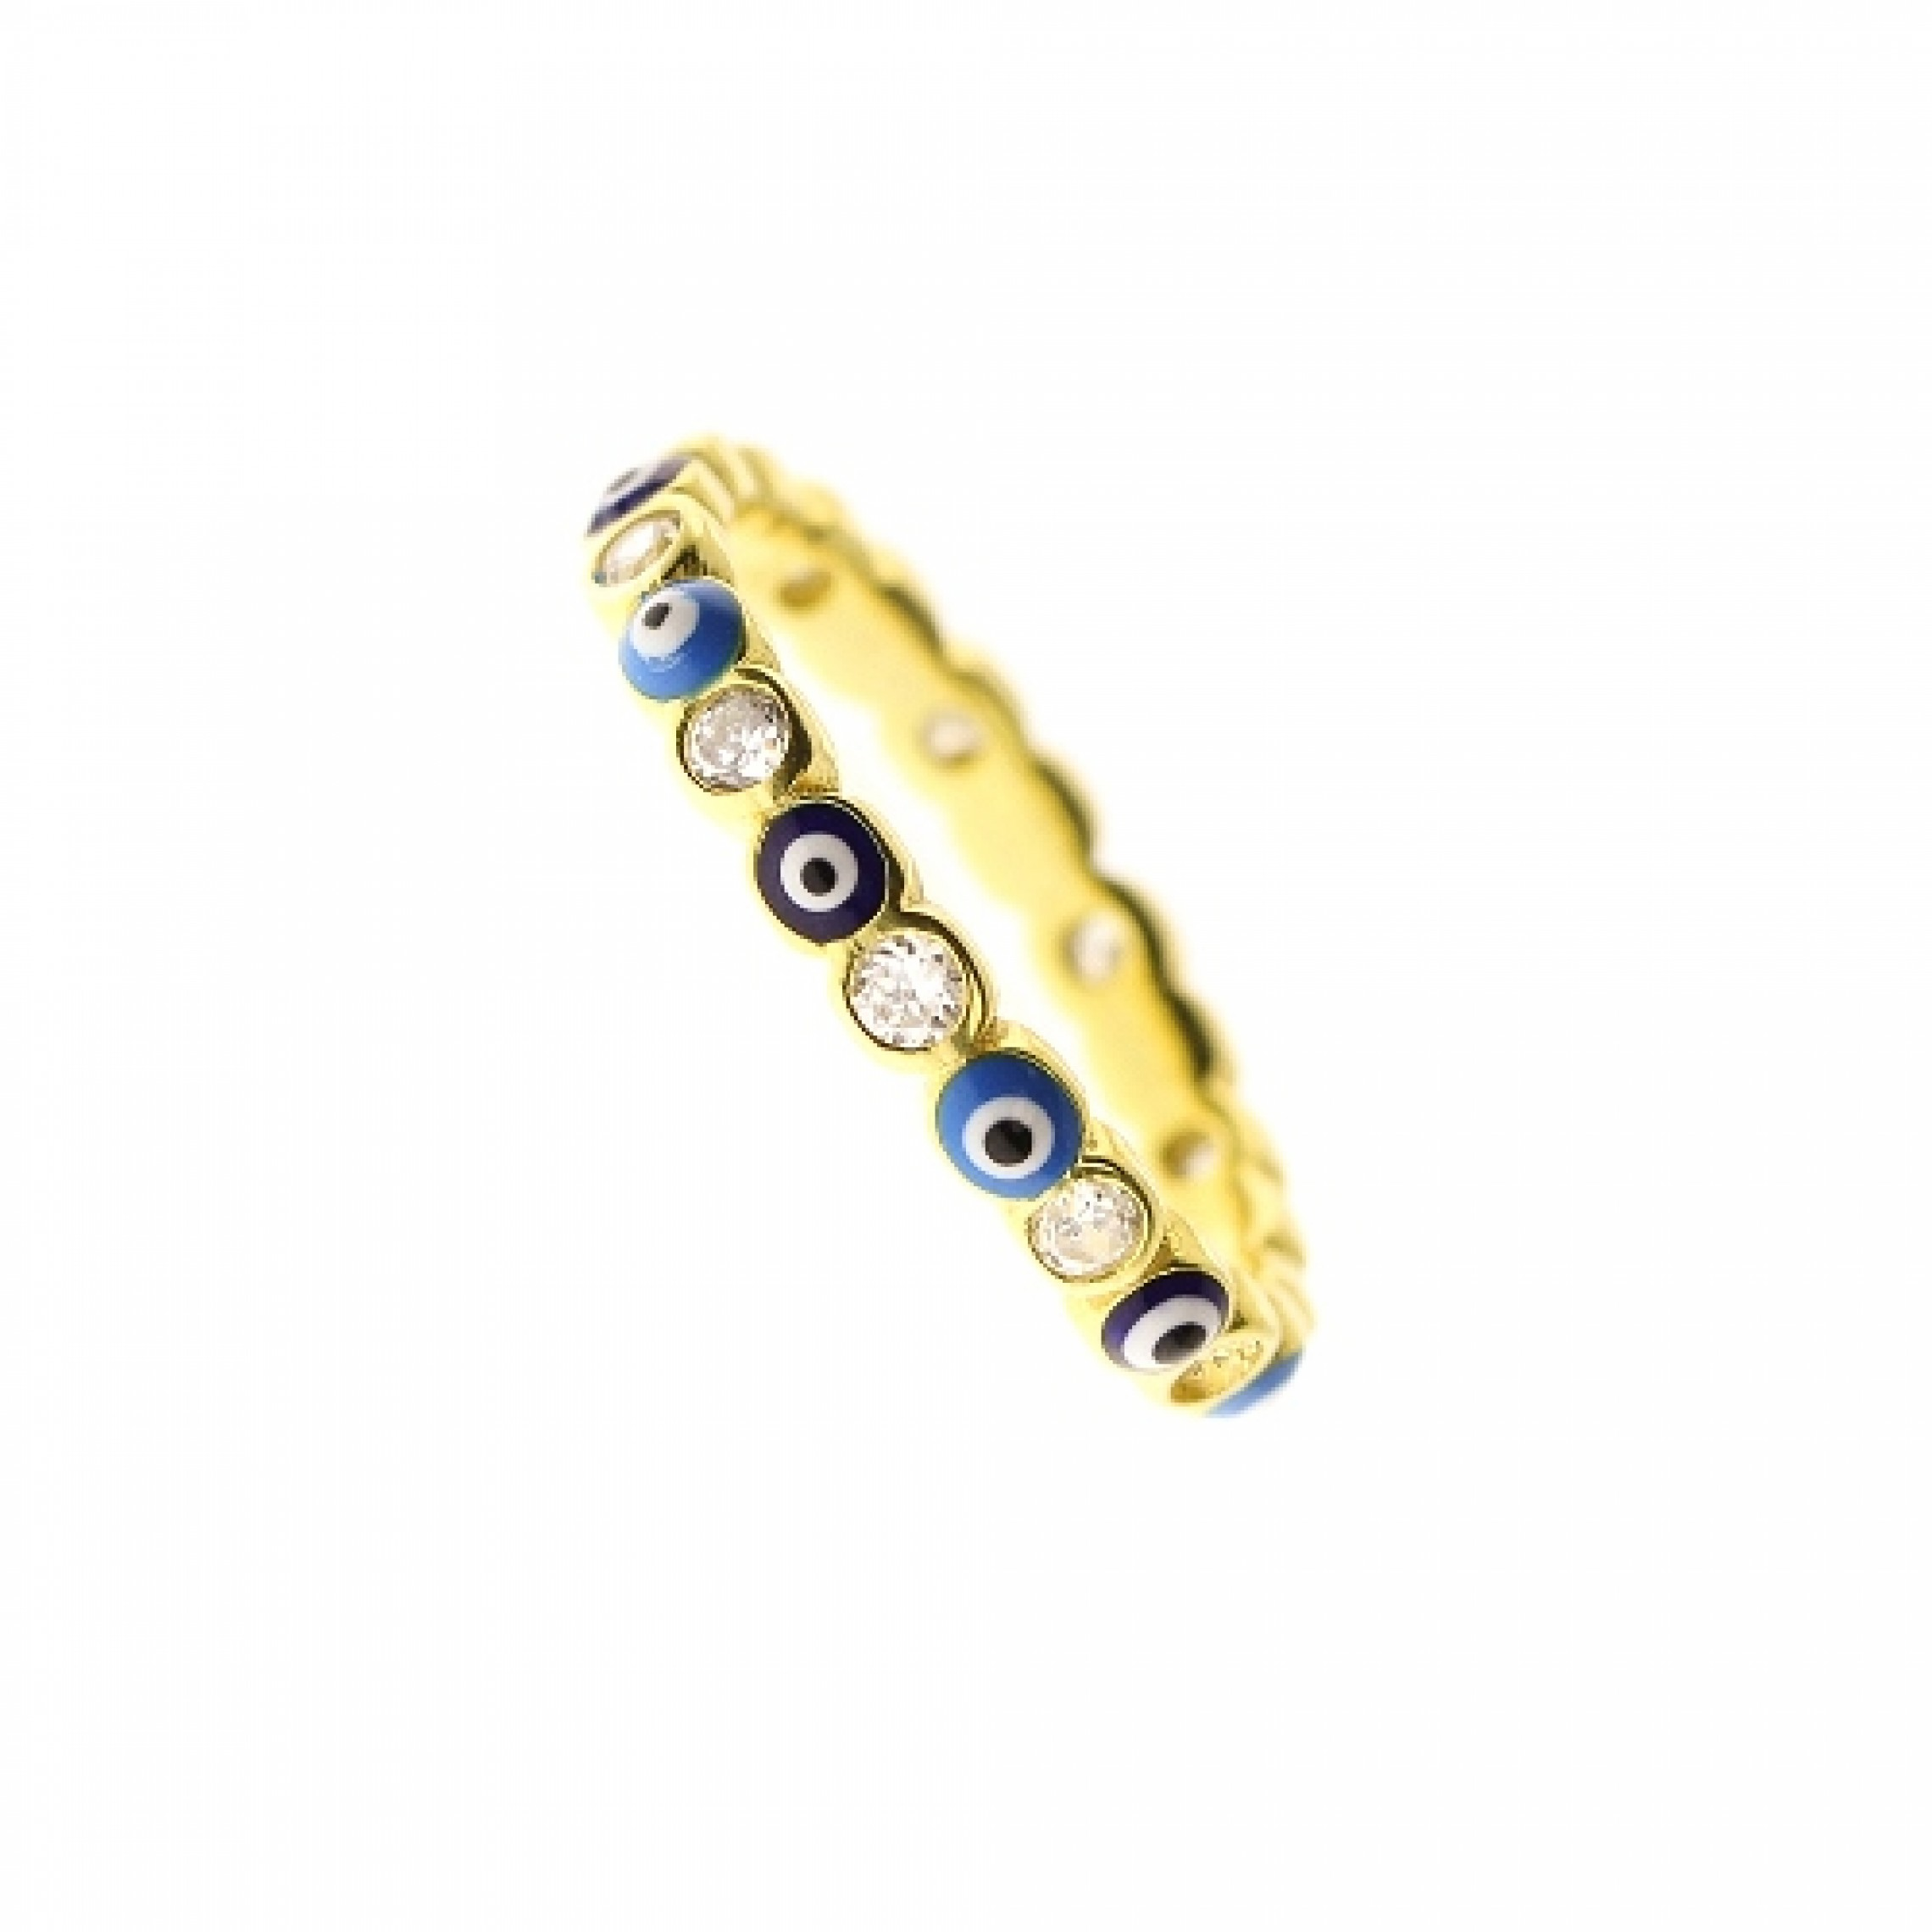 JR-200001 Evil Eye 925 Sterling Silver CZ Ring